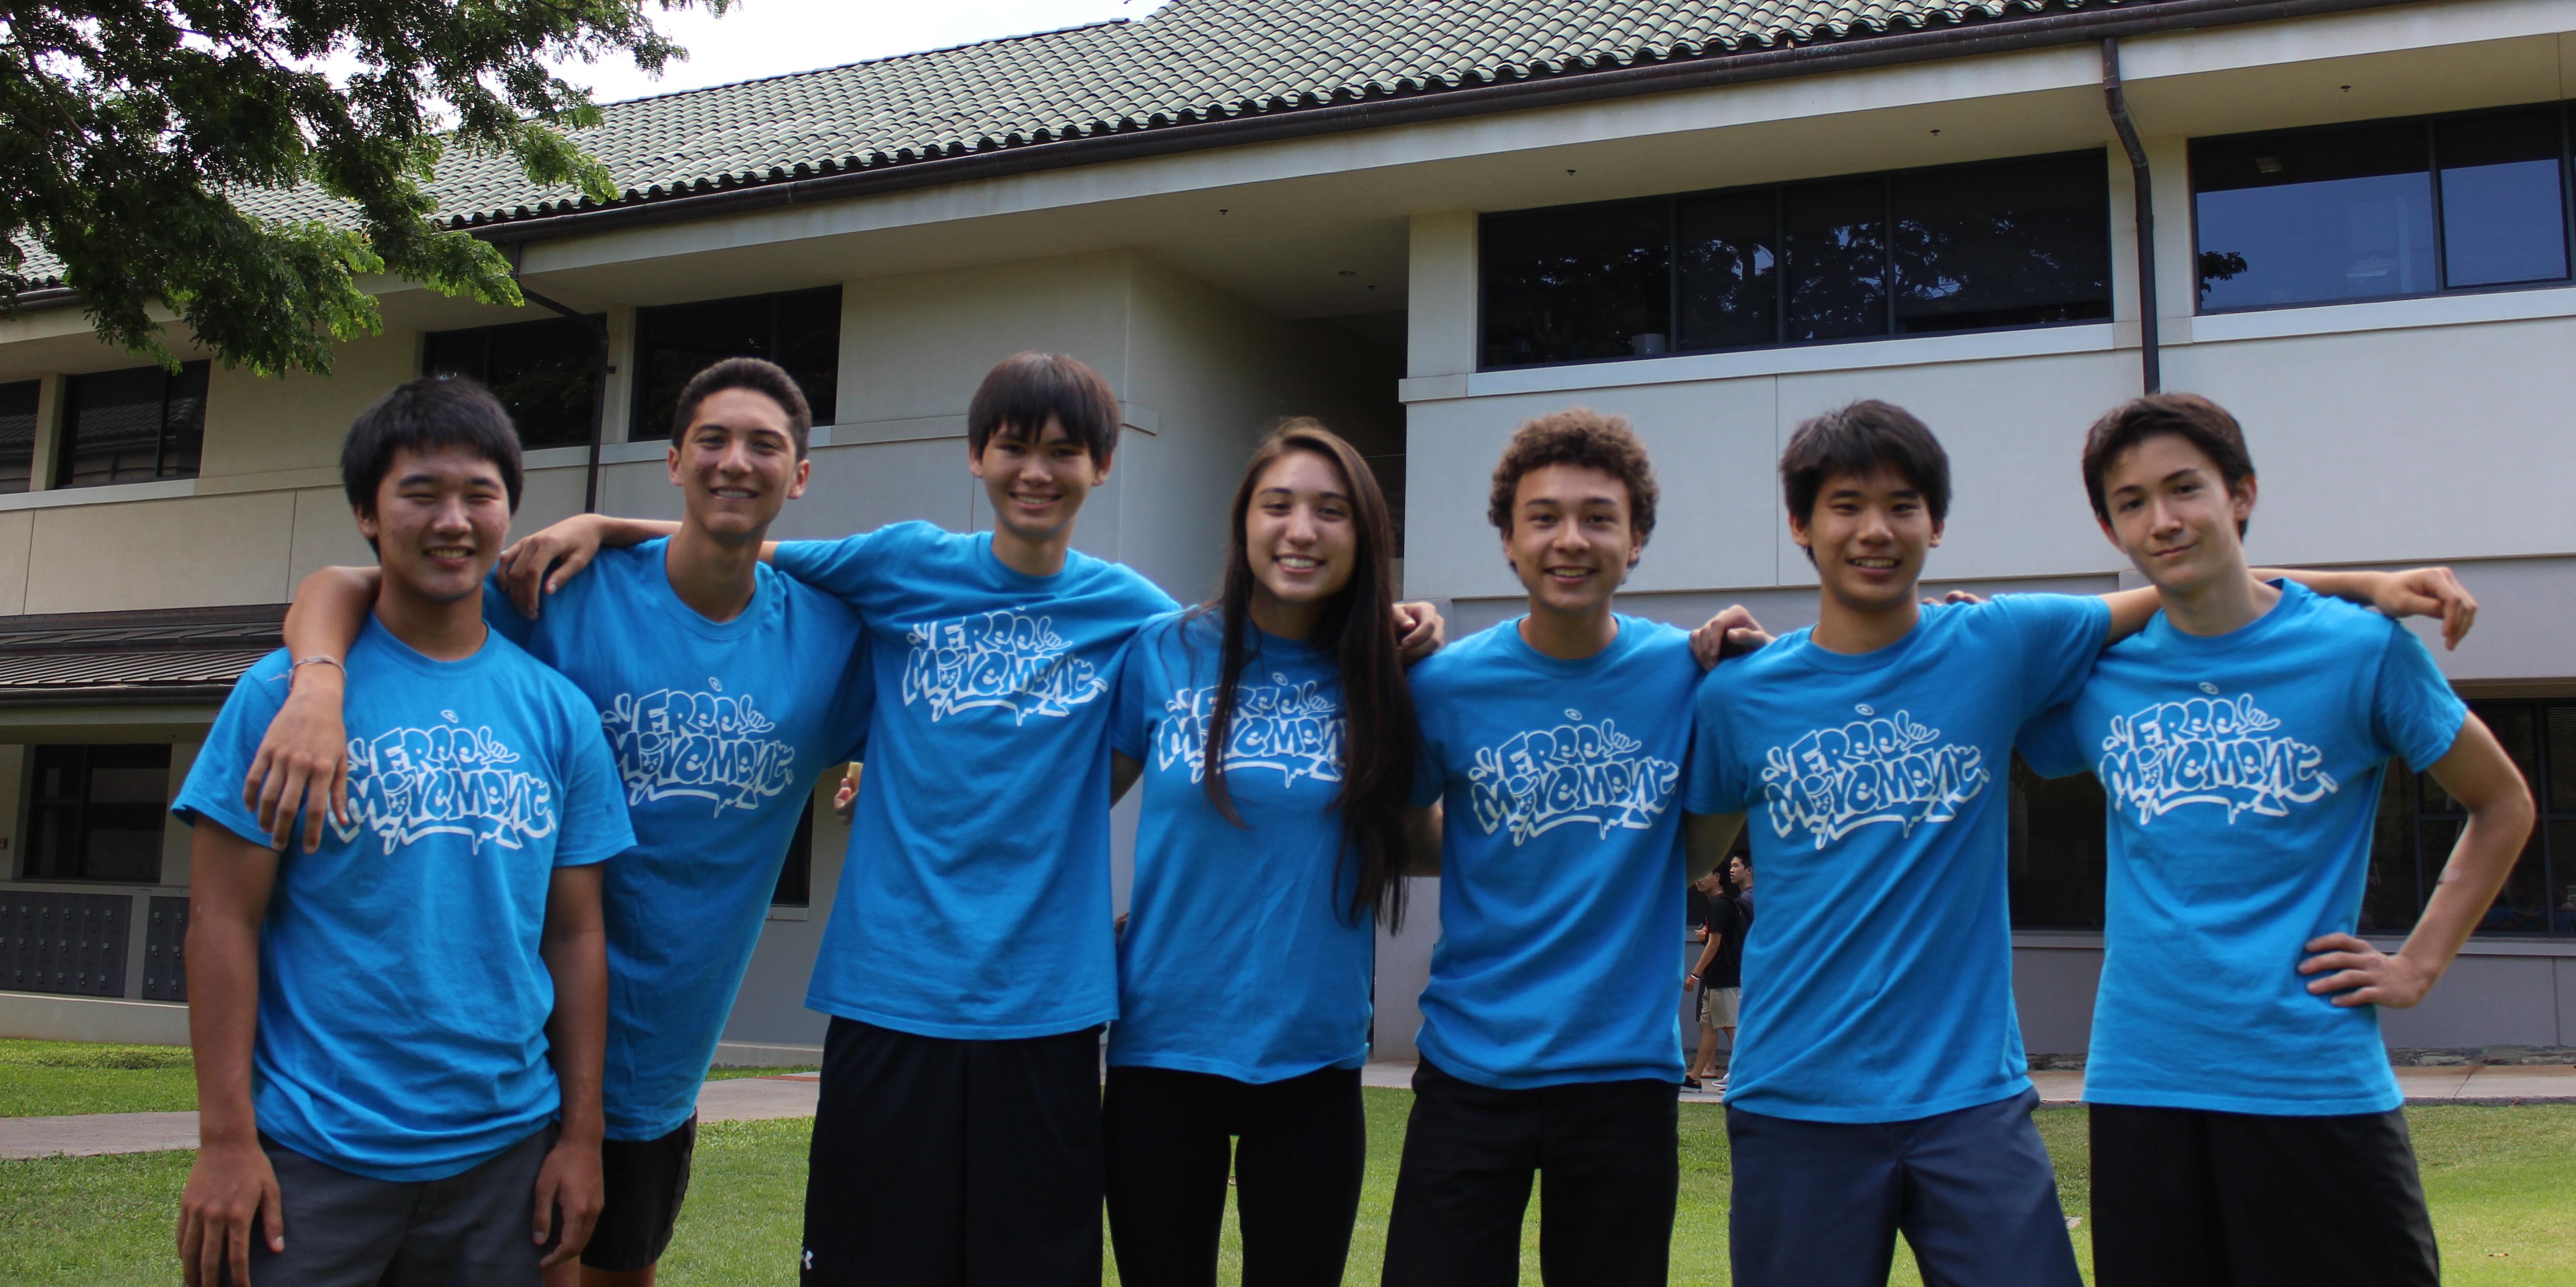 Shirt design lab - Hawaii Free Movement Club T Shirt Photo